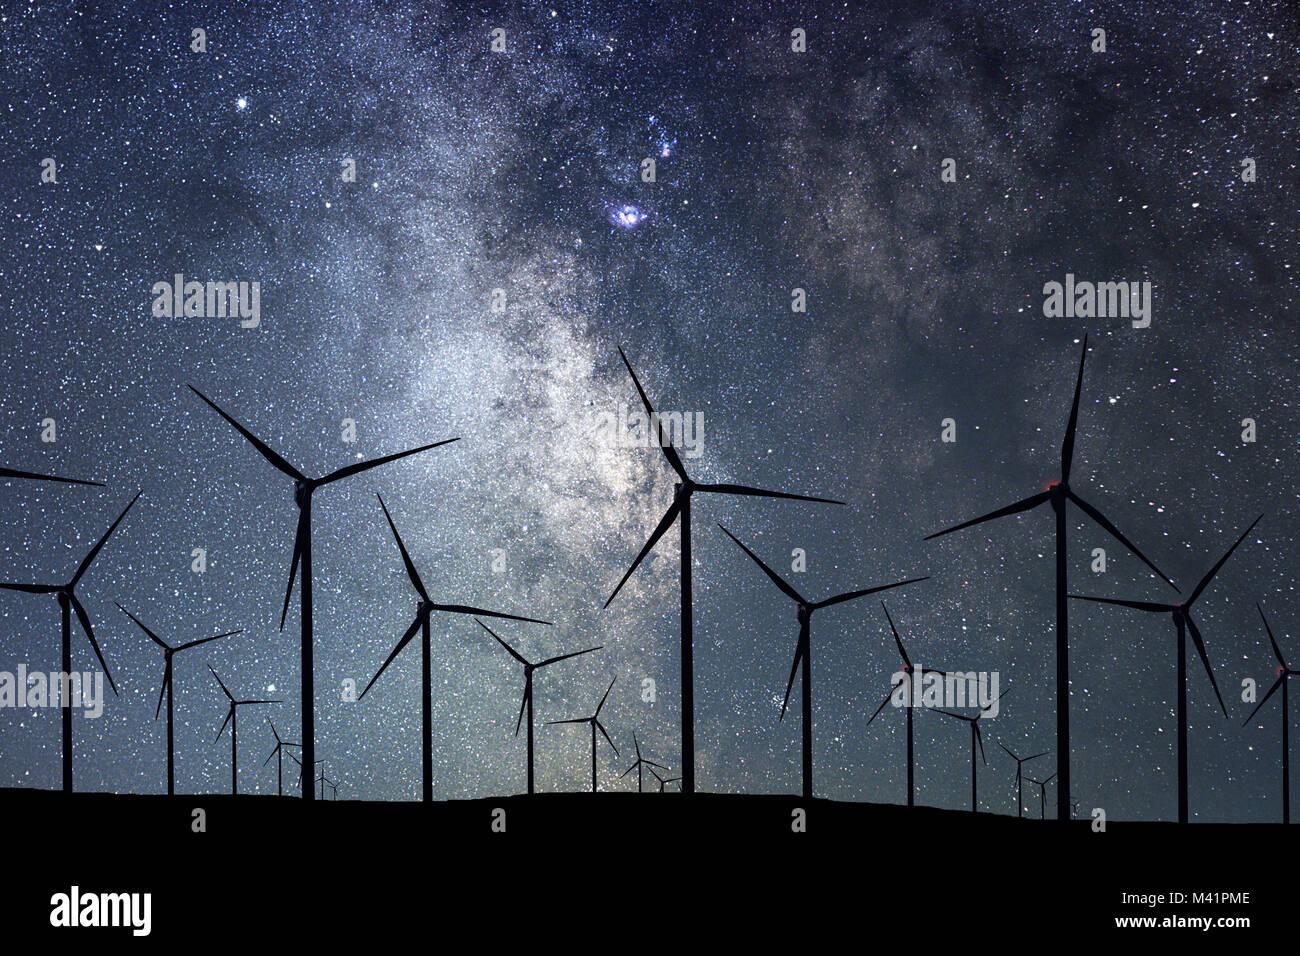 Nachthimmel über Windpark. Energie und Natur Nachthimmel. Stockbild